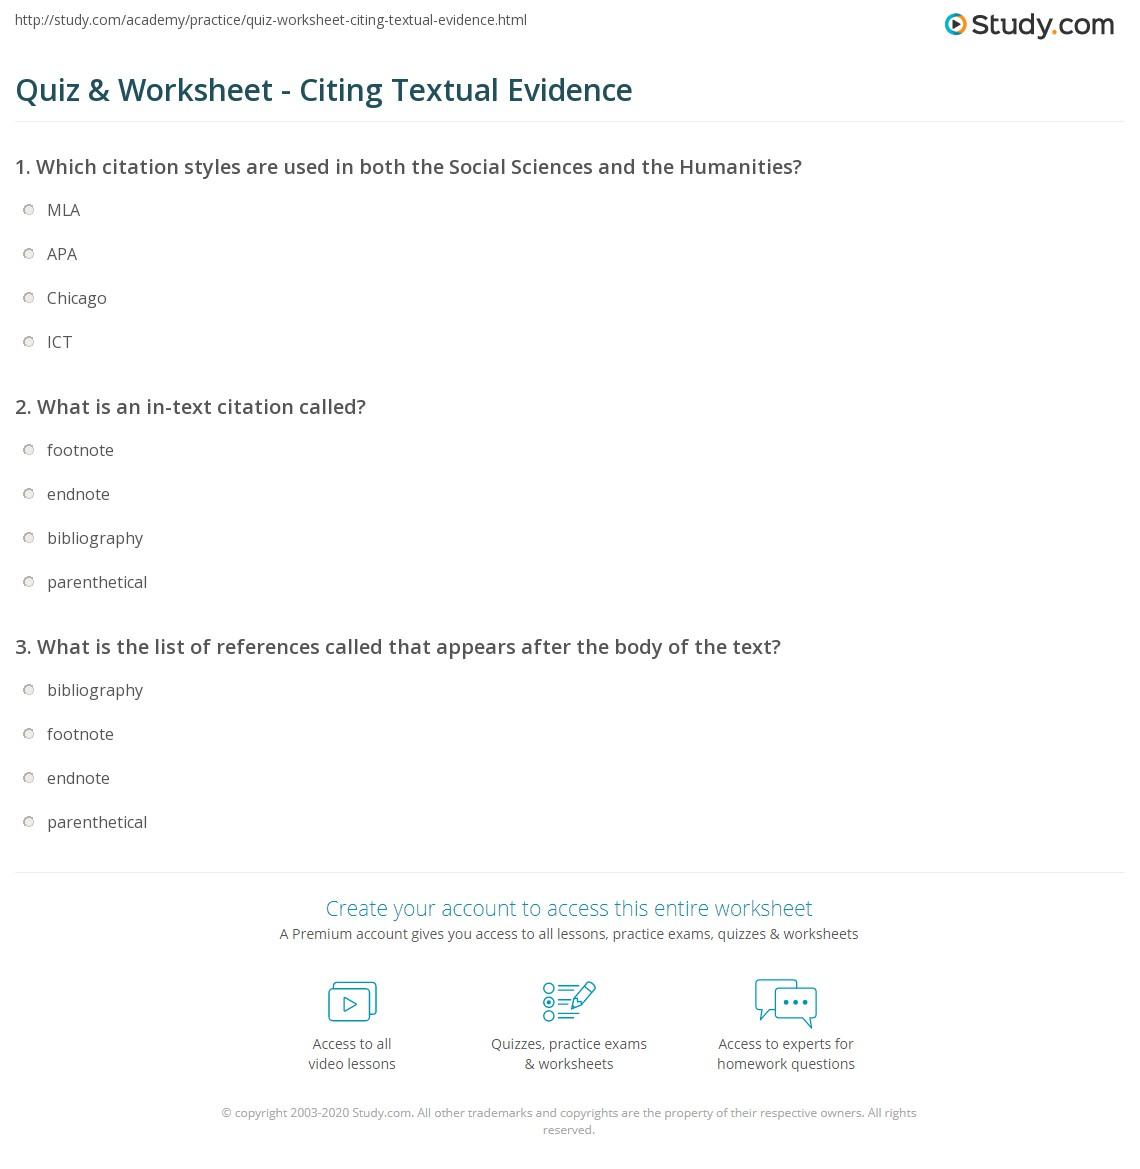 quiz worksheet citing textual evidence. Black Bedroom Furniture Sets. Home Design Ideas